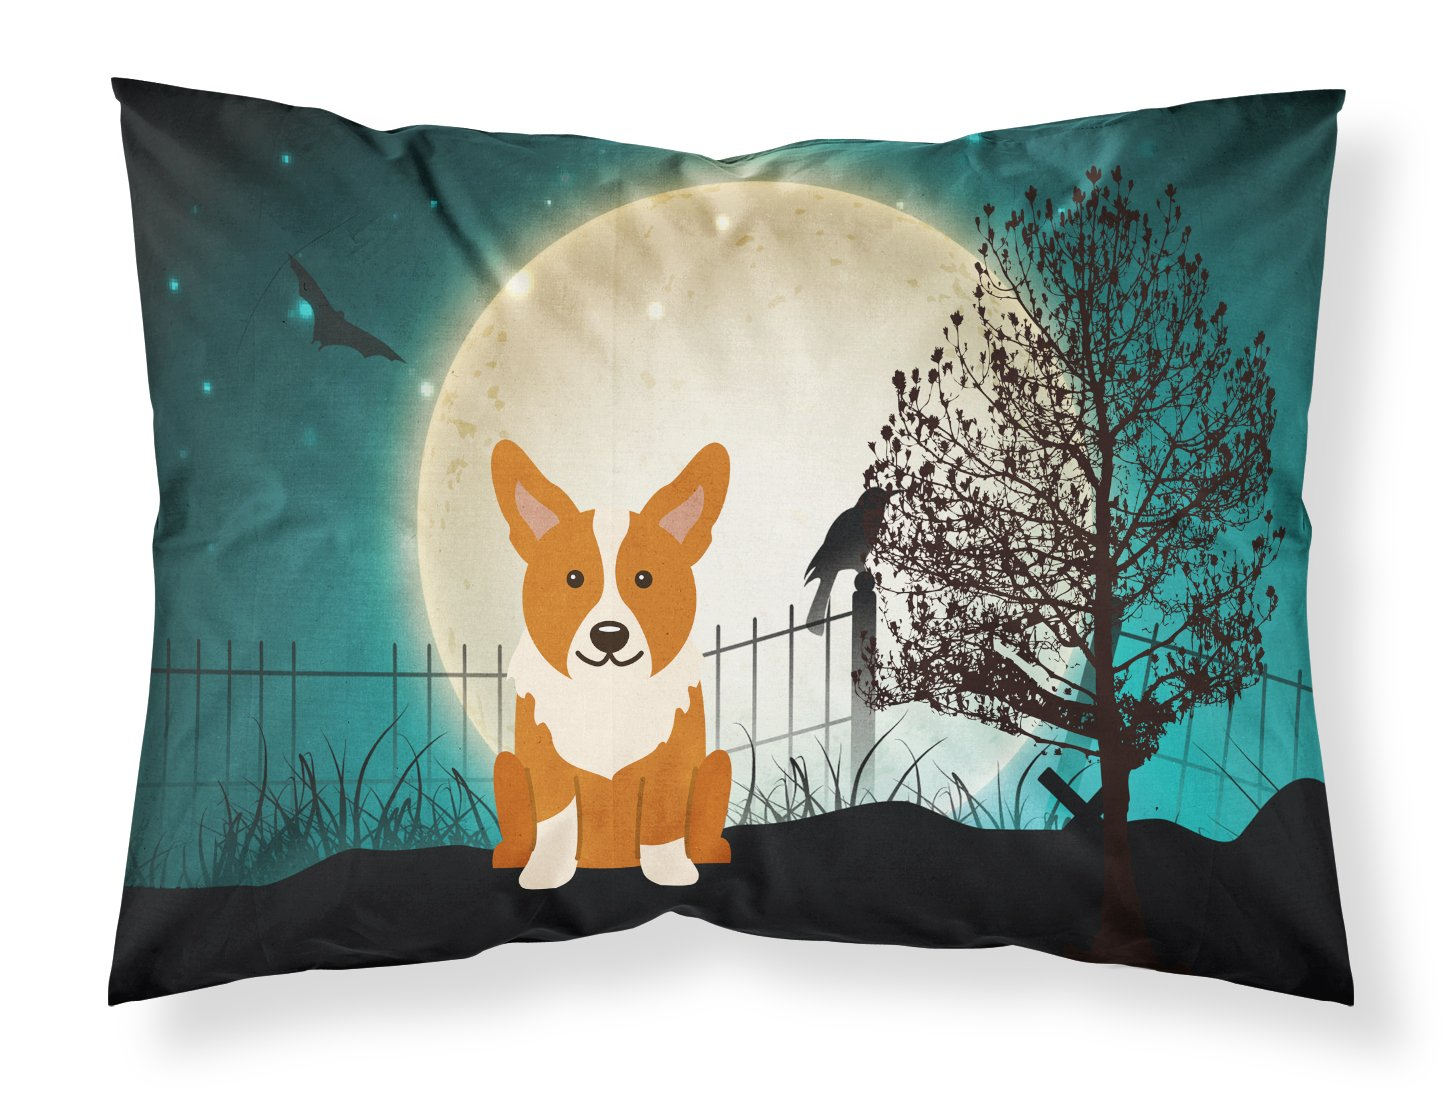 Carolines Treasures Between Friends Bernese Mountain Dog Fabric Standard Pillowcase BB2508PILLOWCASE,